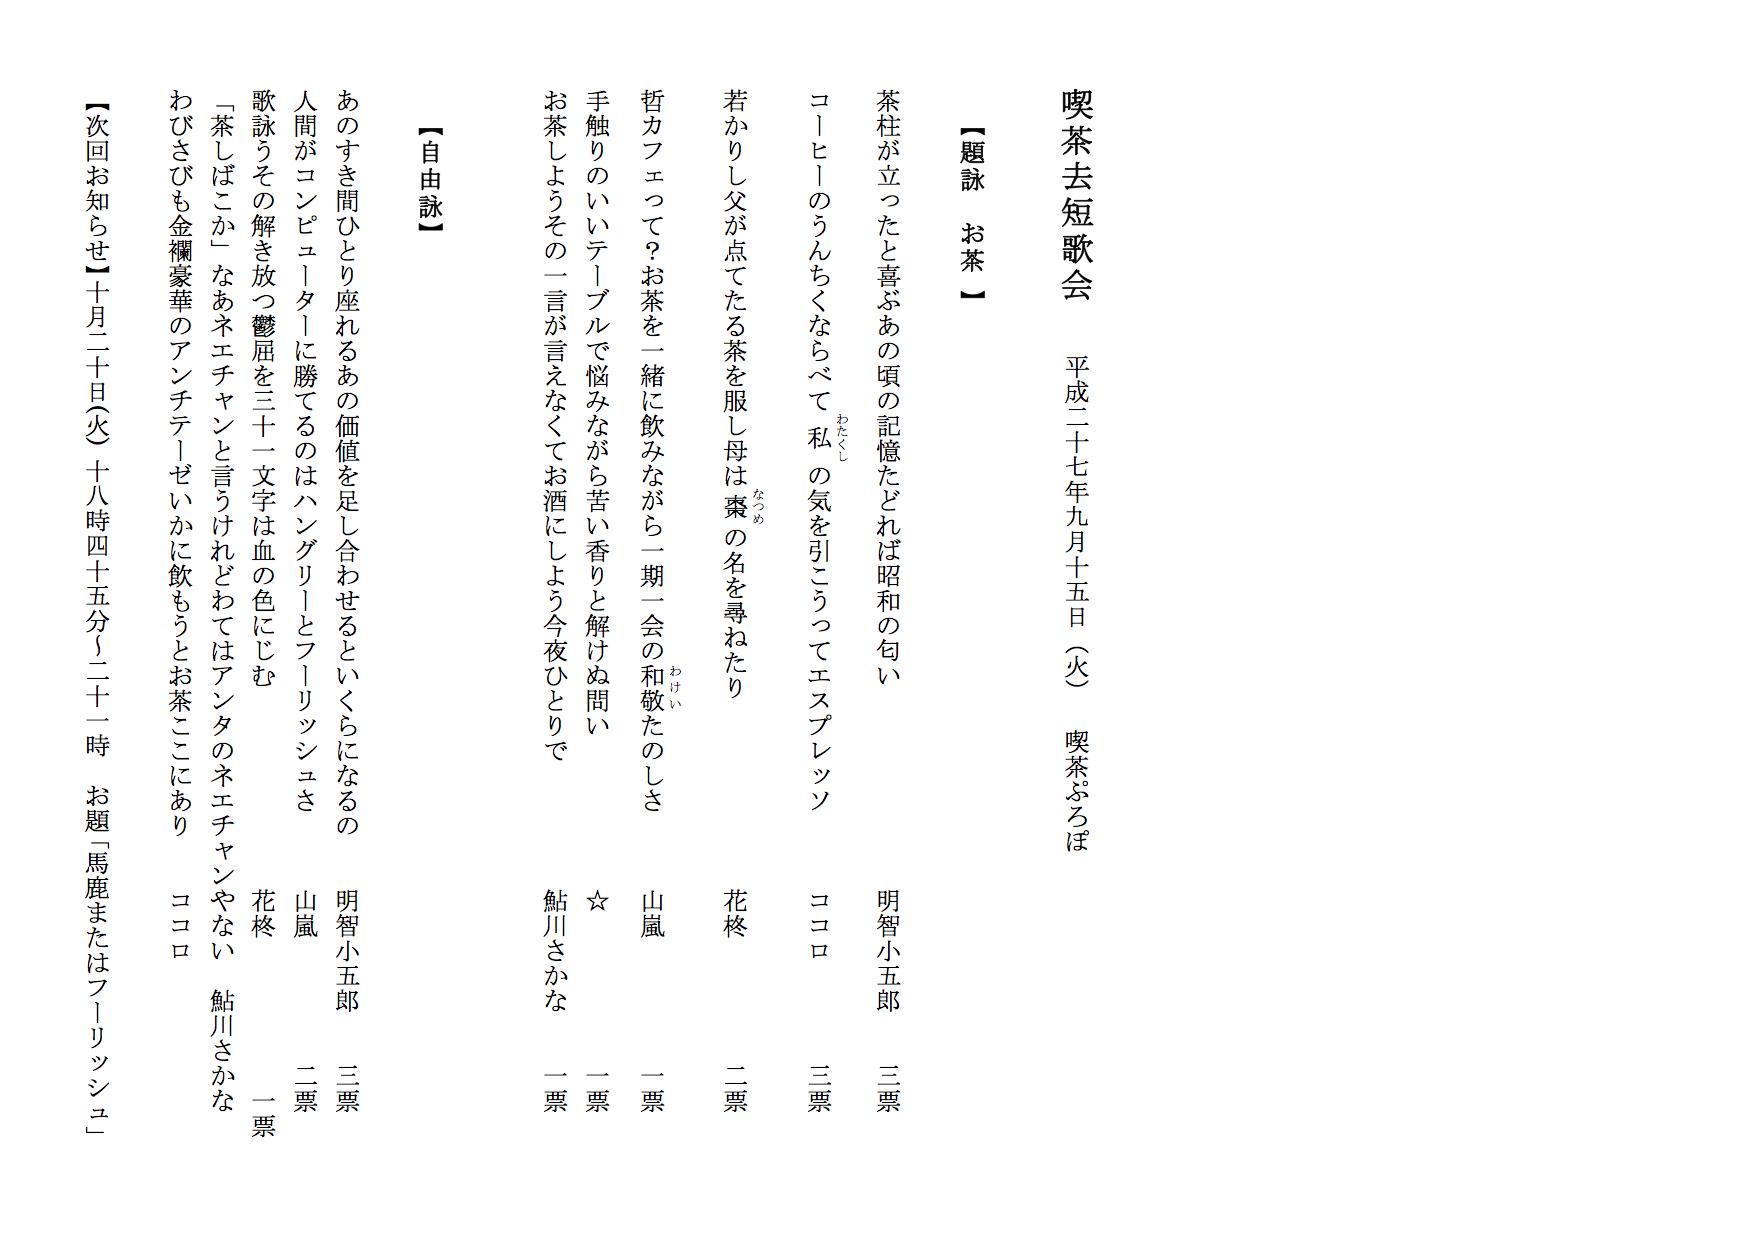 01509 喫茶去短歌会  平成二十七年九月十五日(火) 喫茶ぷろぽ